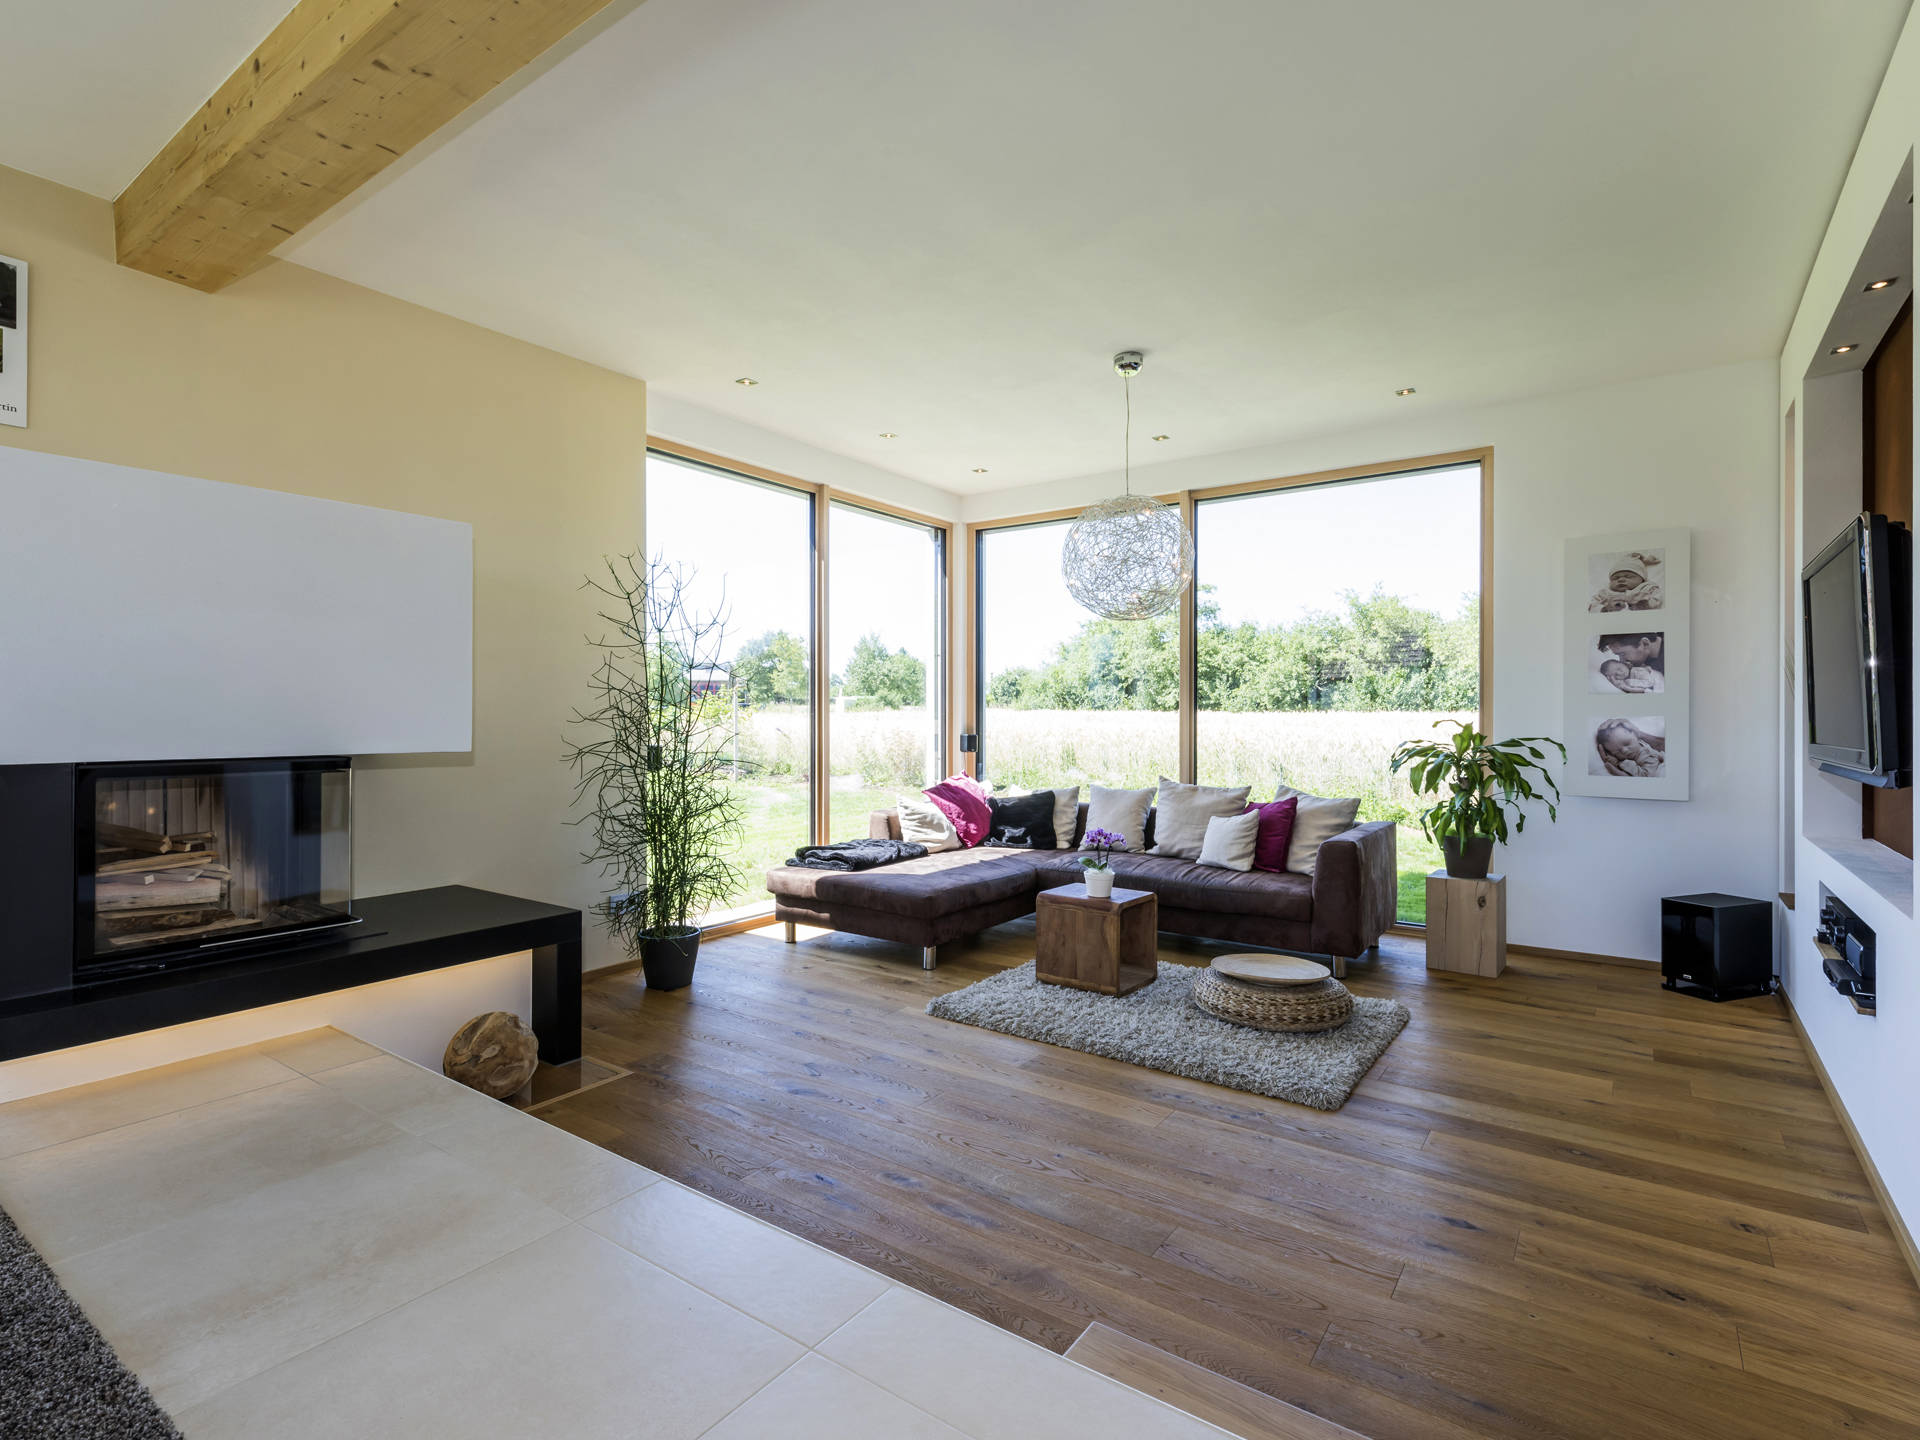 stadtvilla dornhan kitzlingerhaus. Black Bedroom Furniture Sets. Home Design Ideas